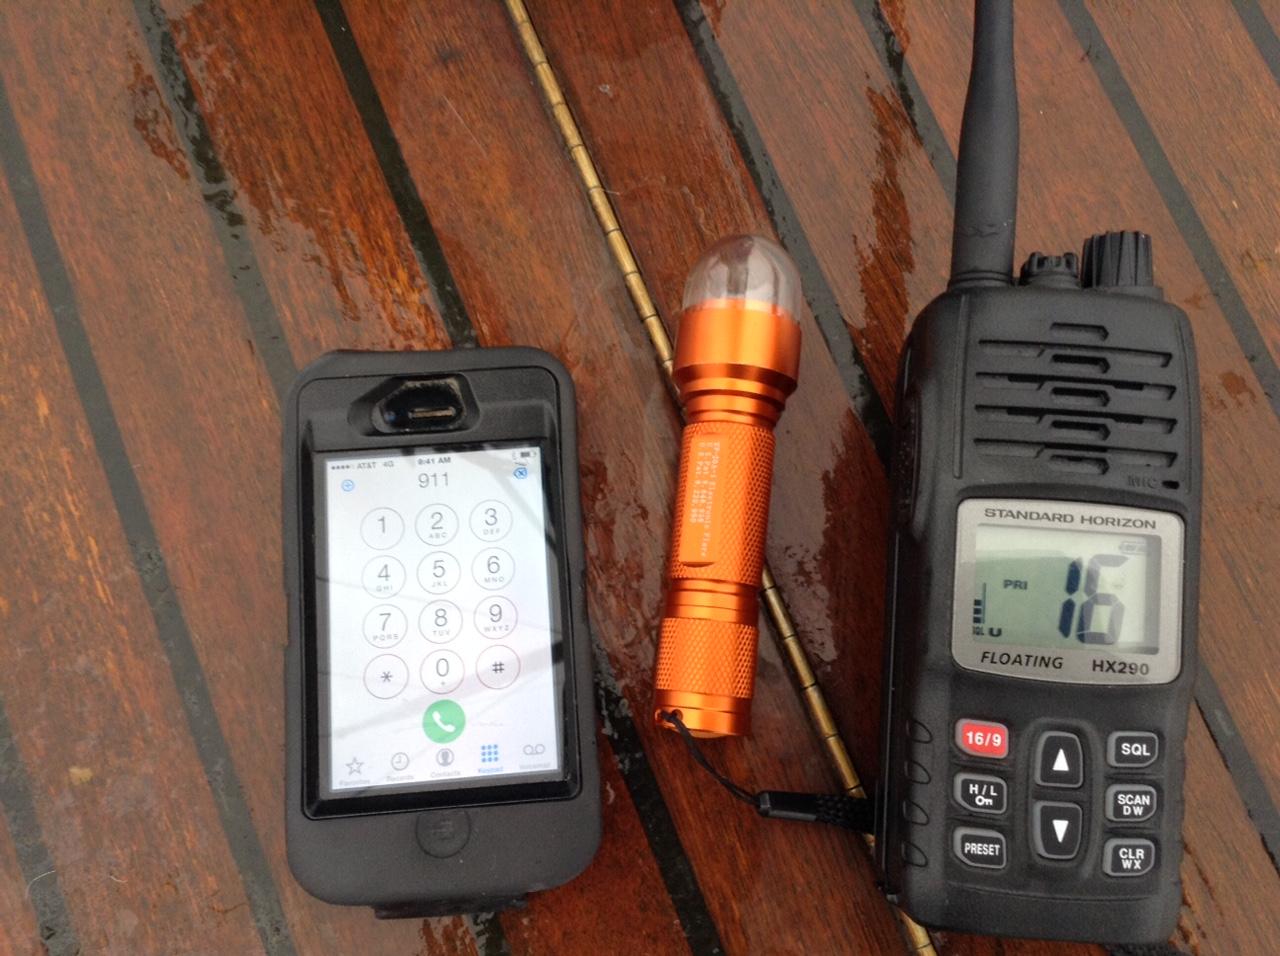 Electronic signal flares